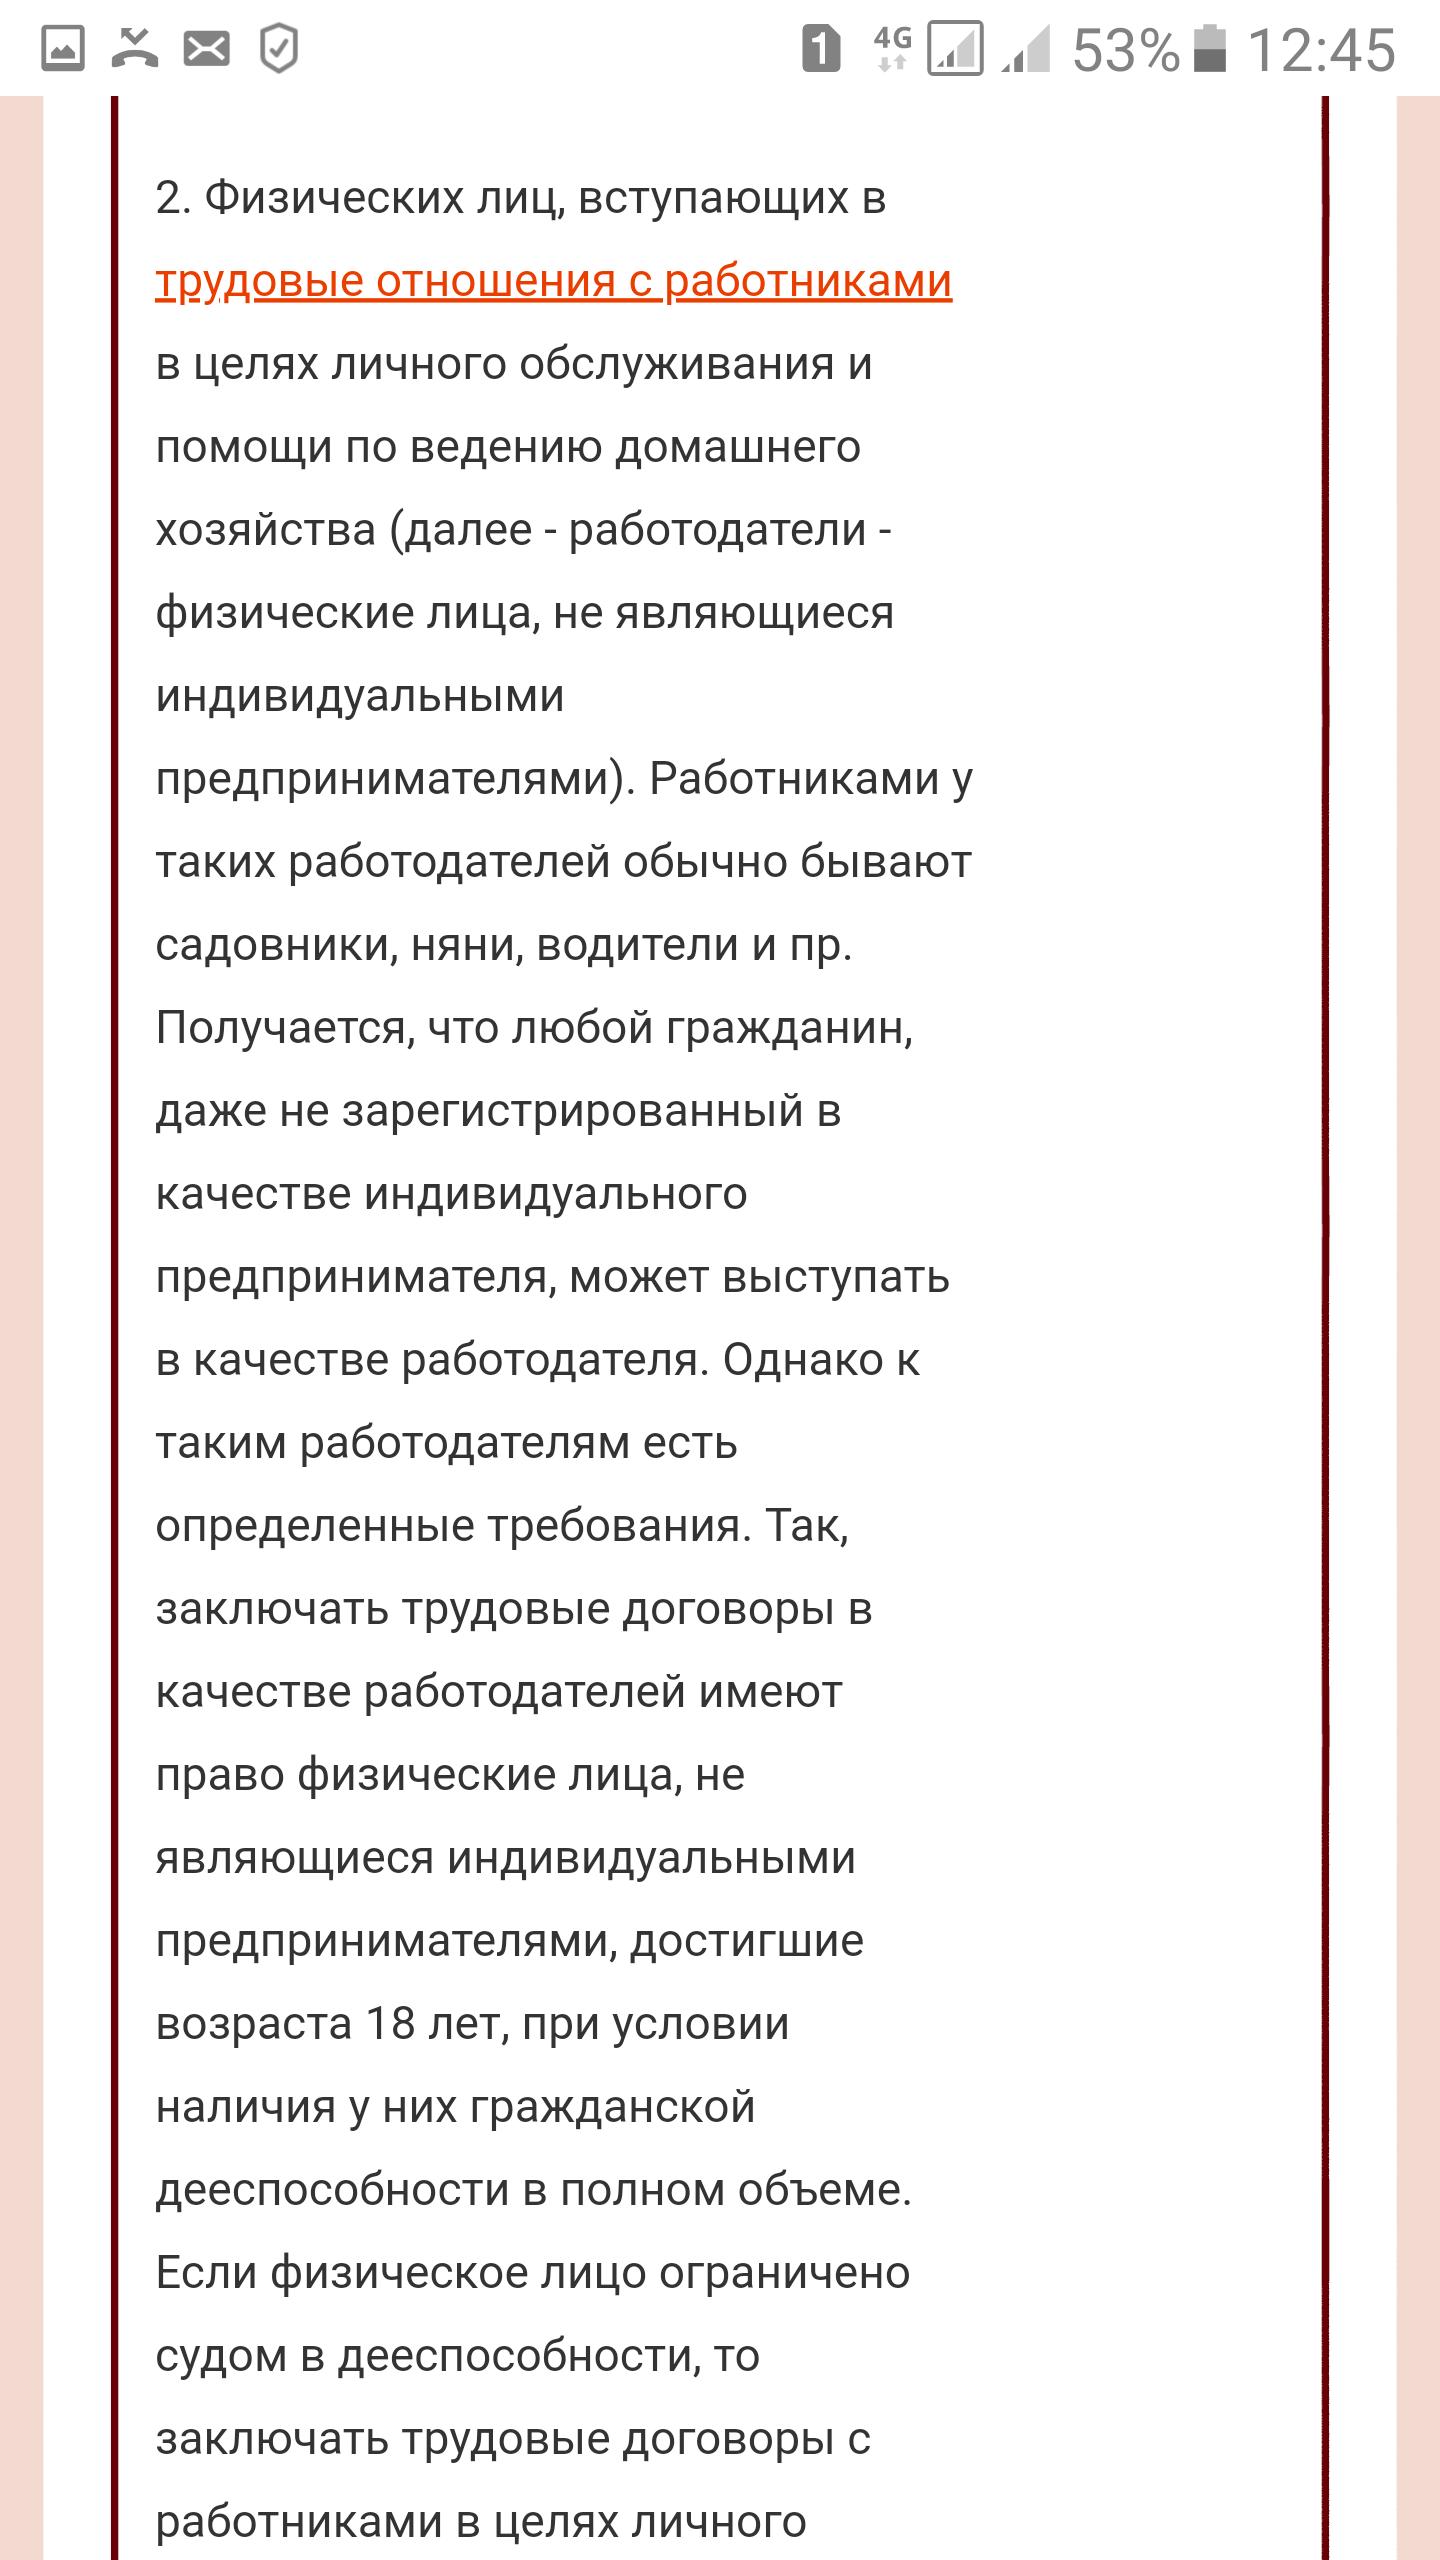 screenshot20190104-124535.png